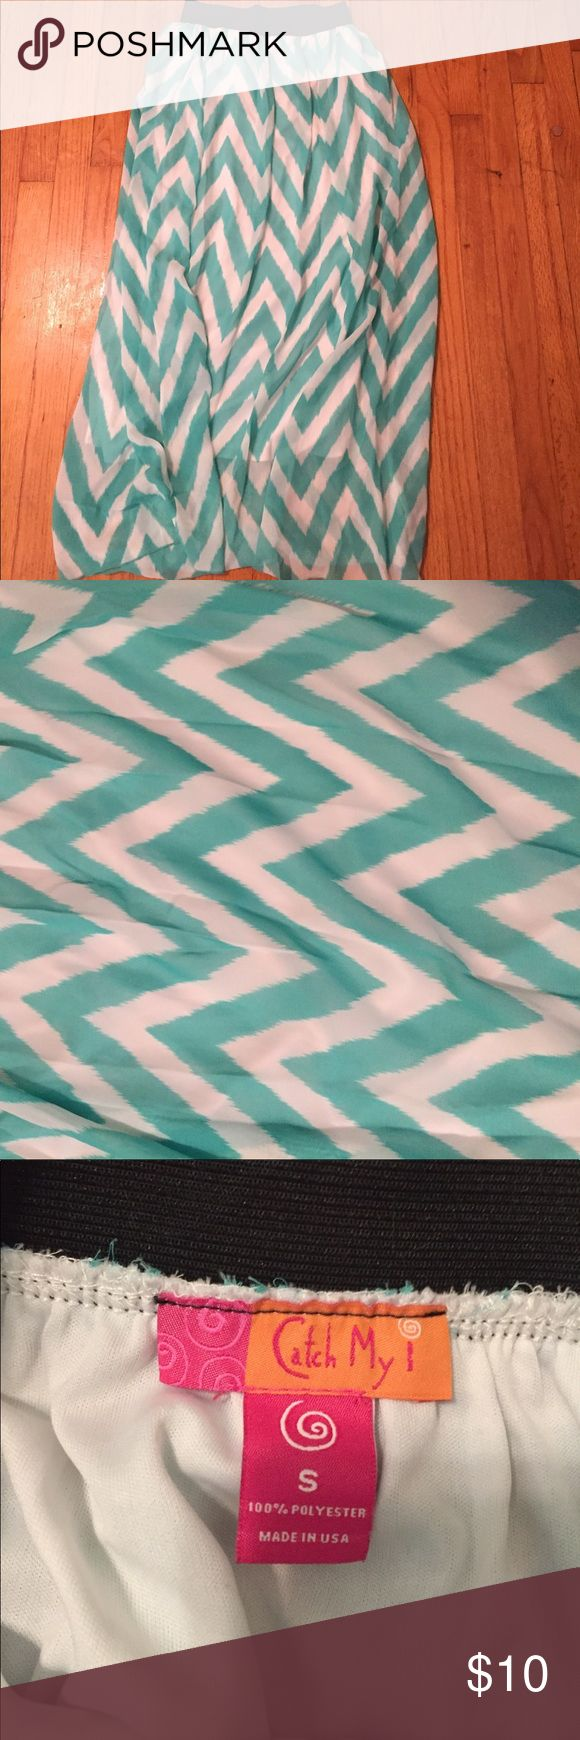 Chevron maxi skirt Turquoise and white maxi skirt from Dillard's. Skirts Maxi